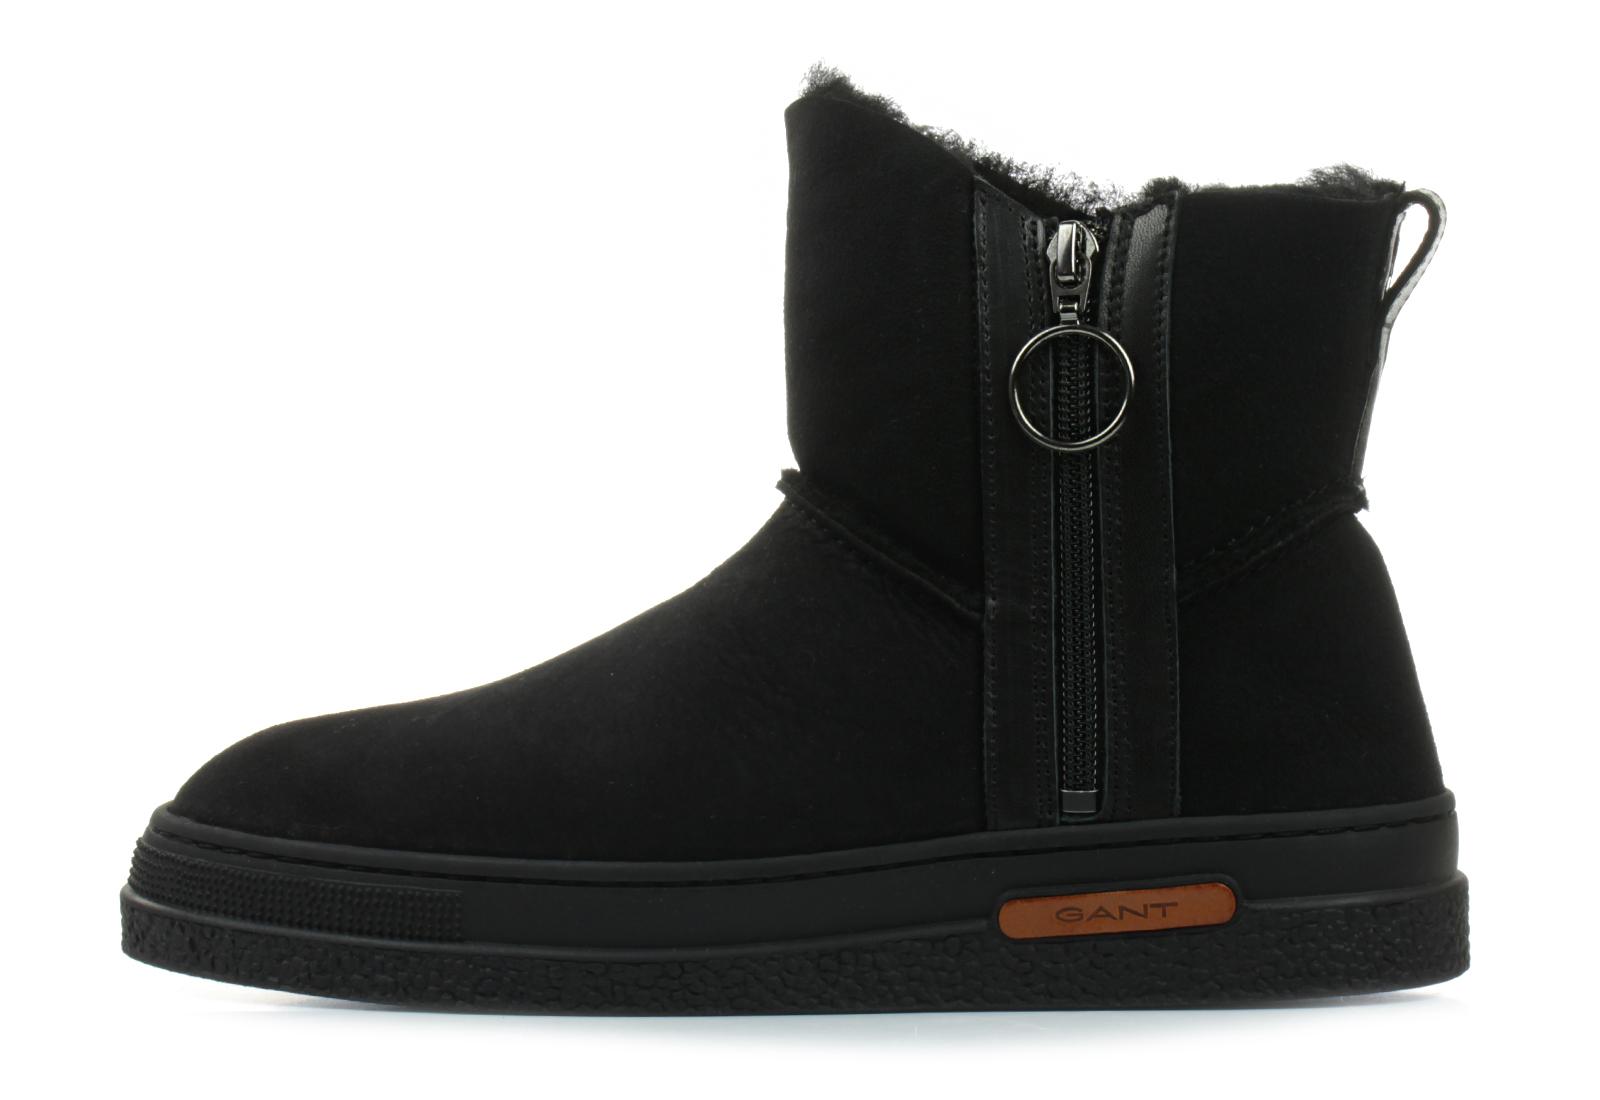 39097951b7e Gant Boots - Maria Zip - 15548147-G00 - Online shop for sneakers ...